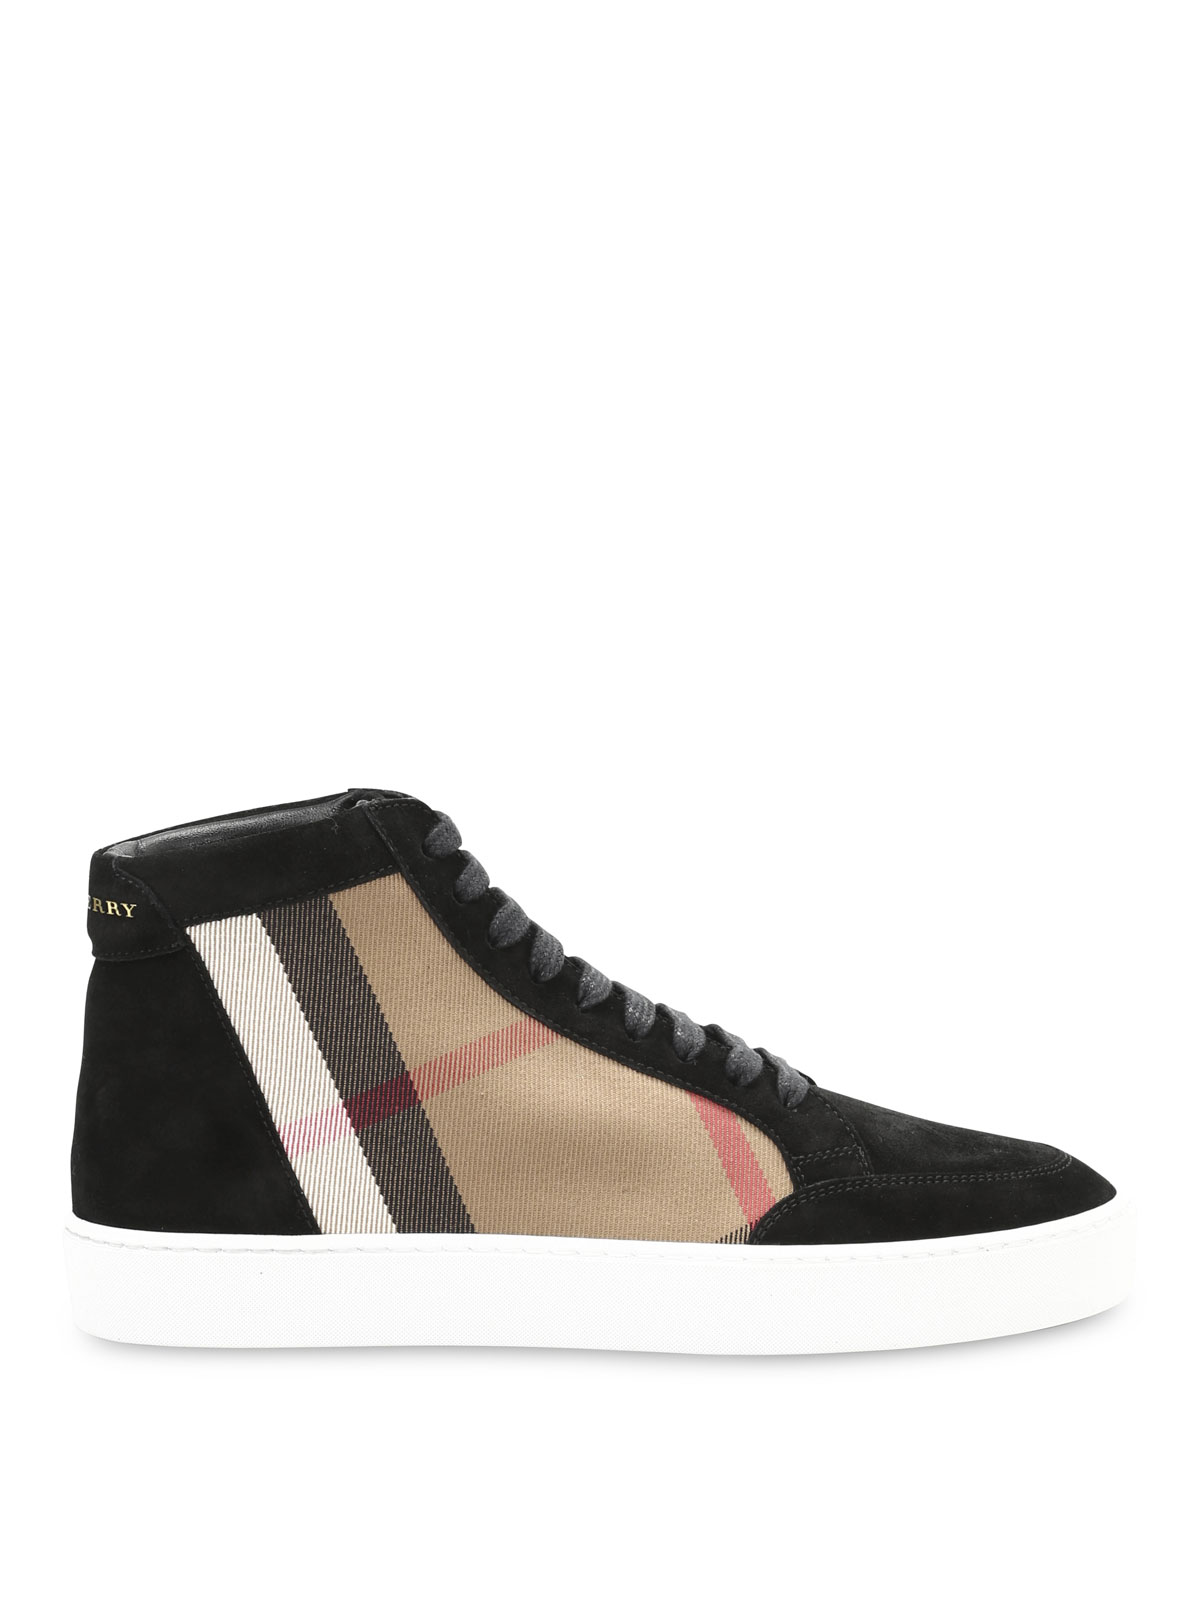 a7b485868cd8 Burberry - Baskets Noir Pour Femme - Chaussures de sport - 4024919 ...